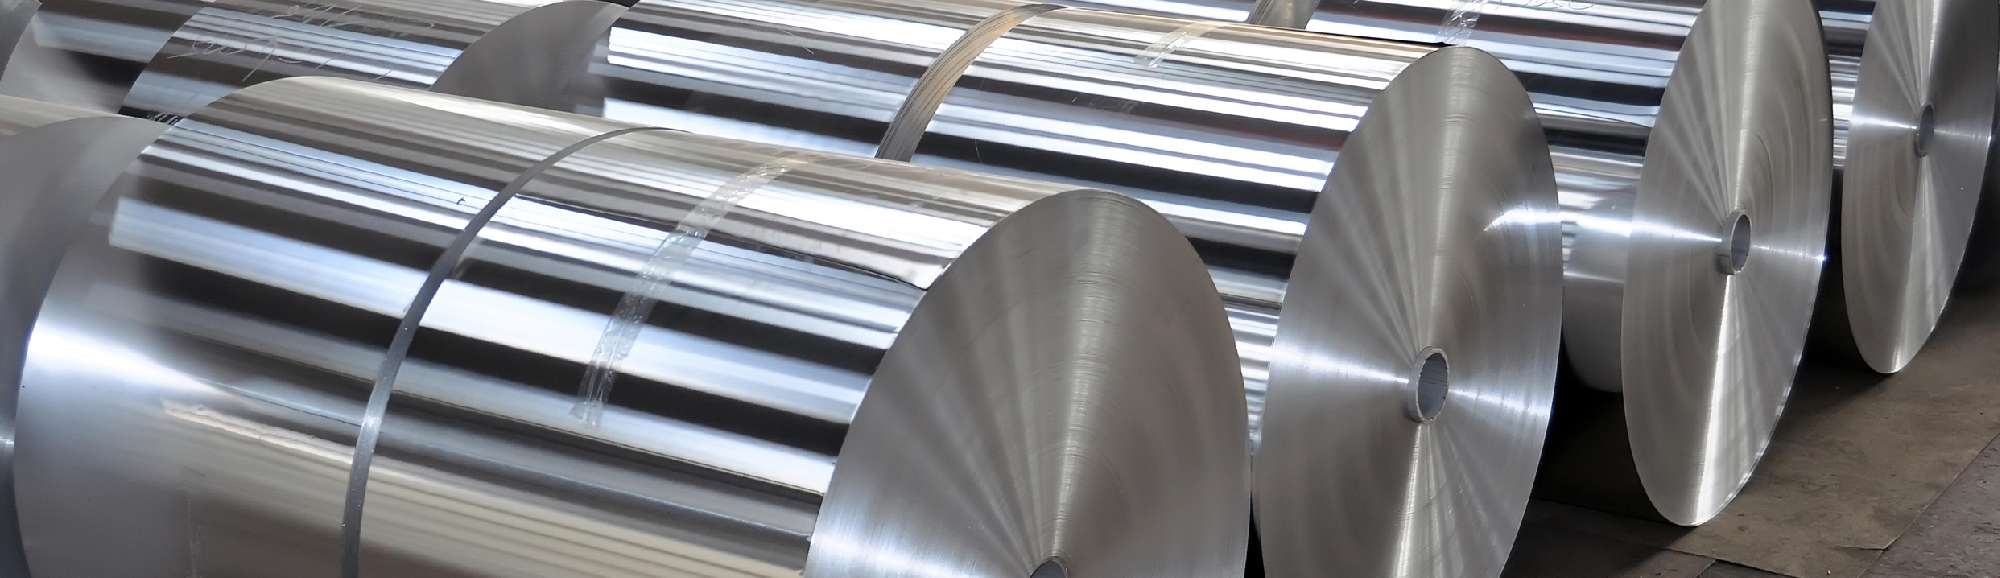 Alloy Steel 1541-4037-4135-4140-B16